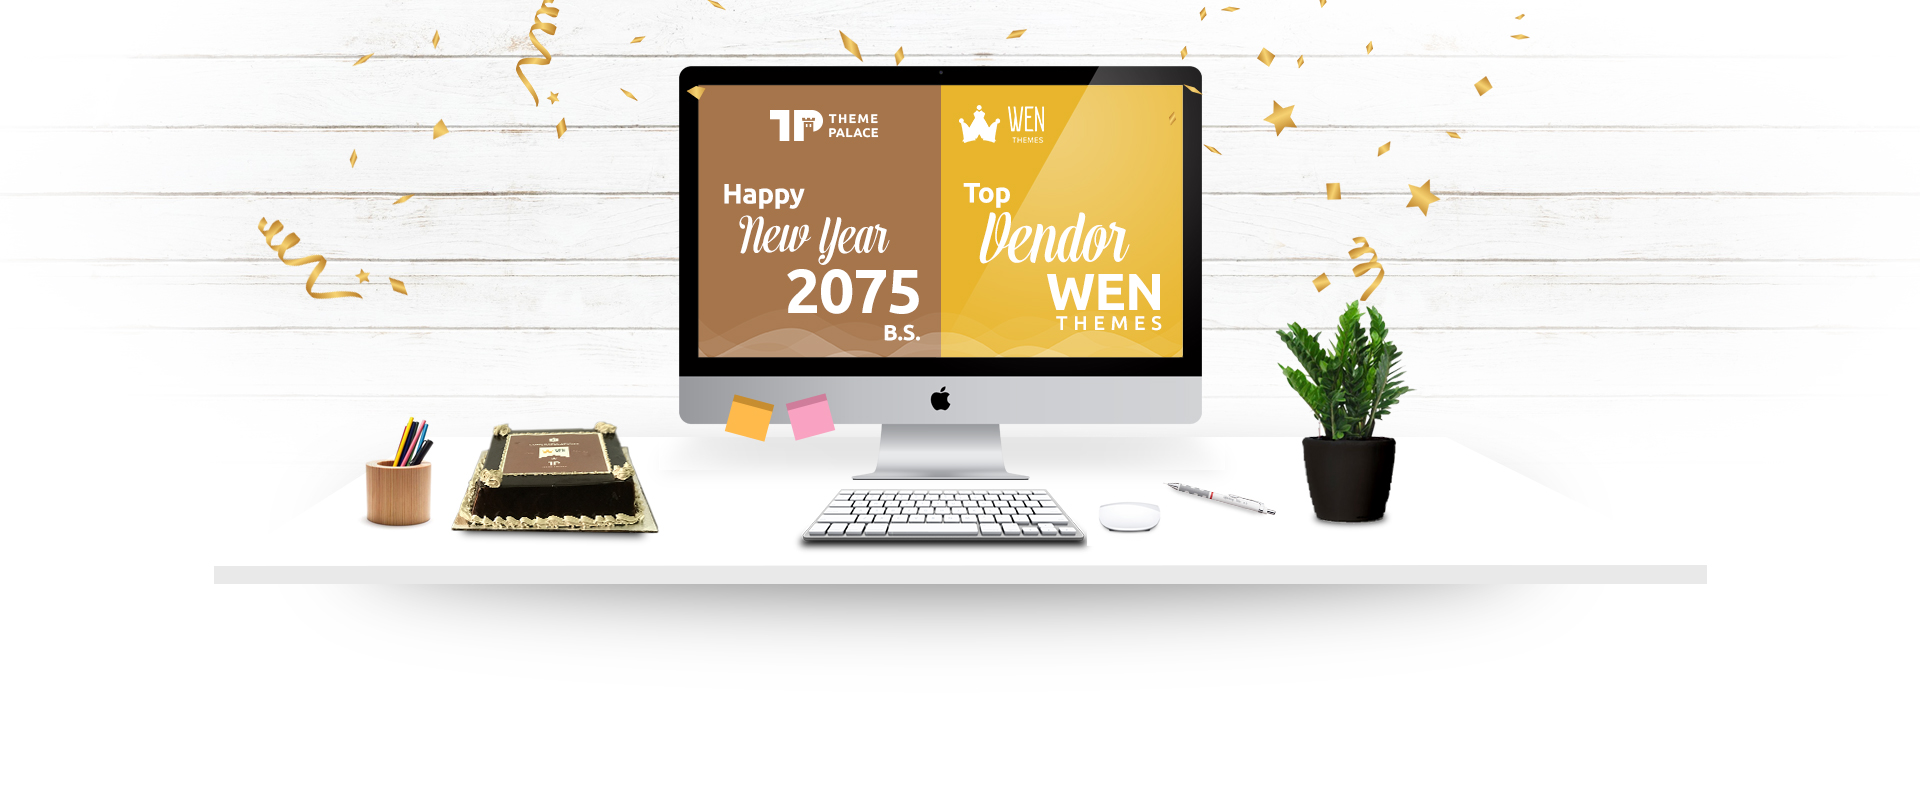 happy new year 2075